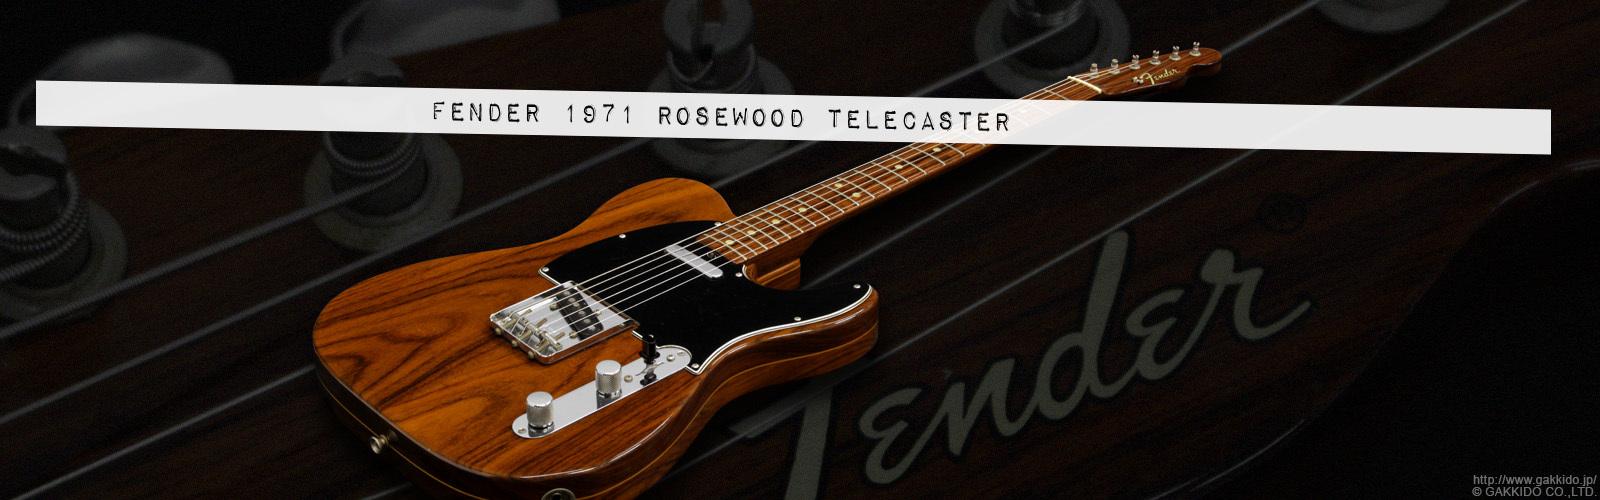 Fender 1971 Rosewood Telecaster [中古品]